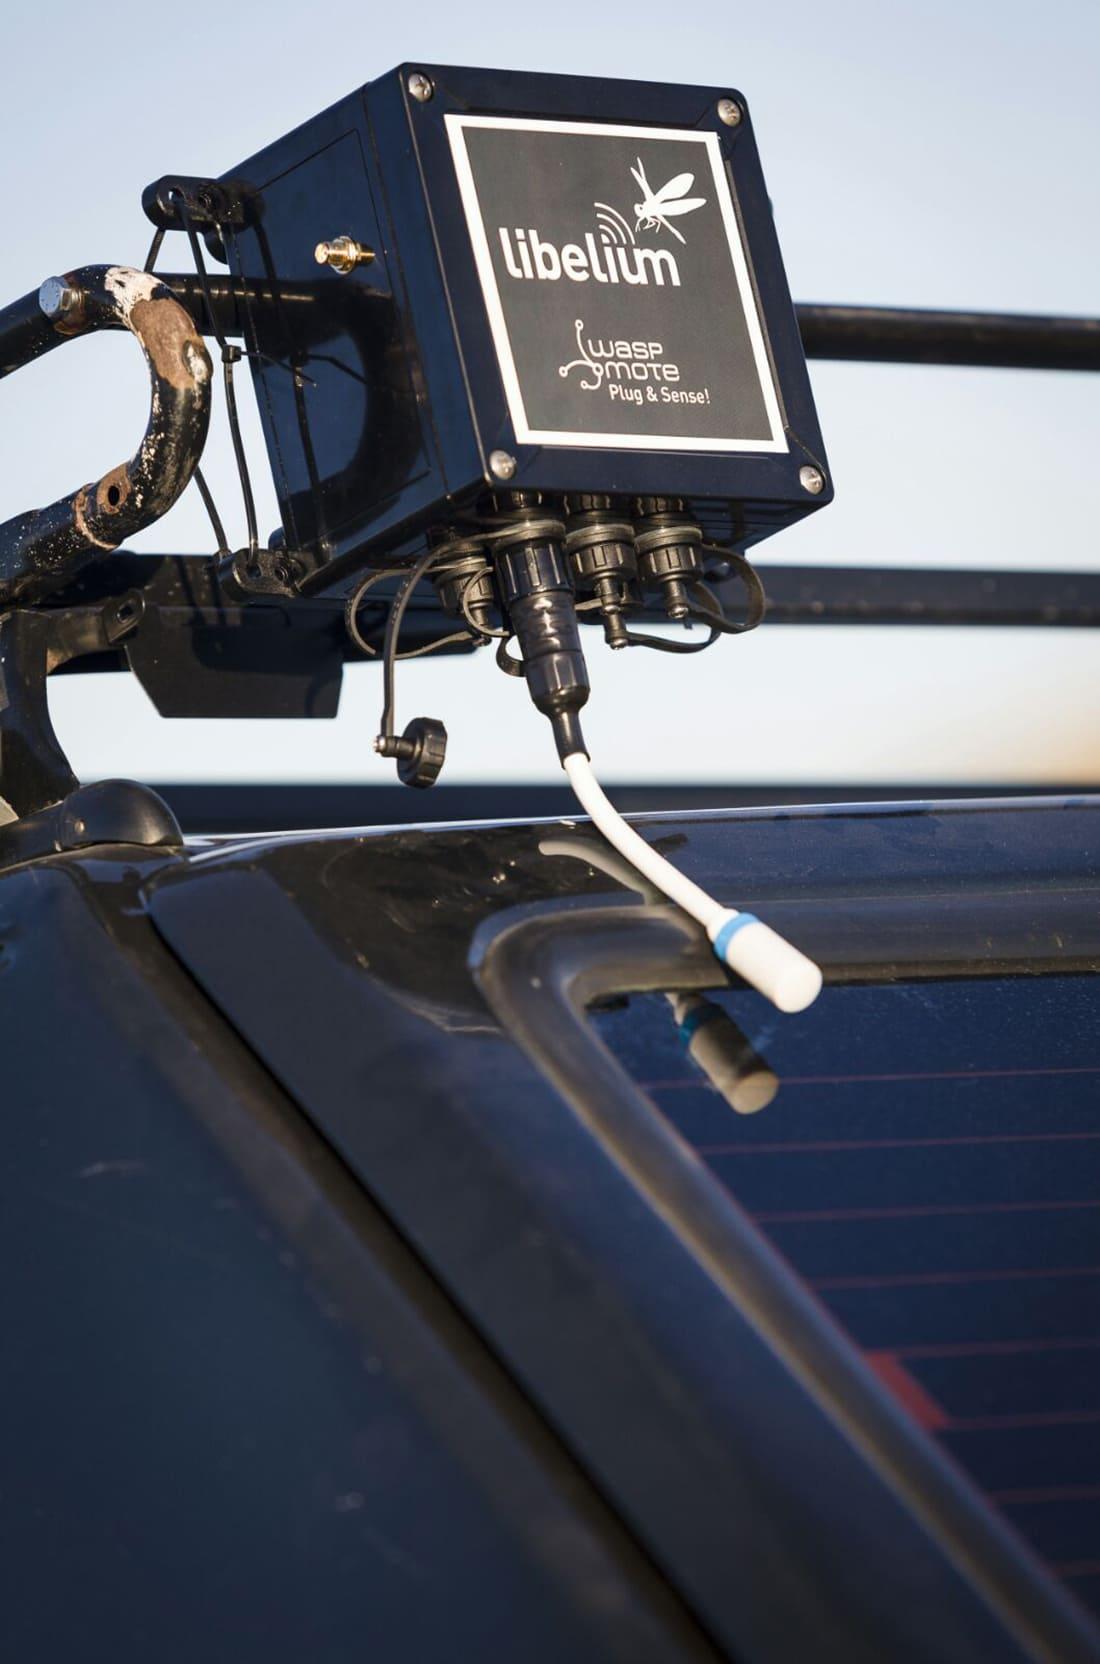 Waspmote Plug & Sense! Sensor Platform installed in the car